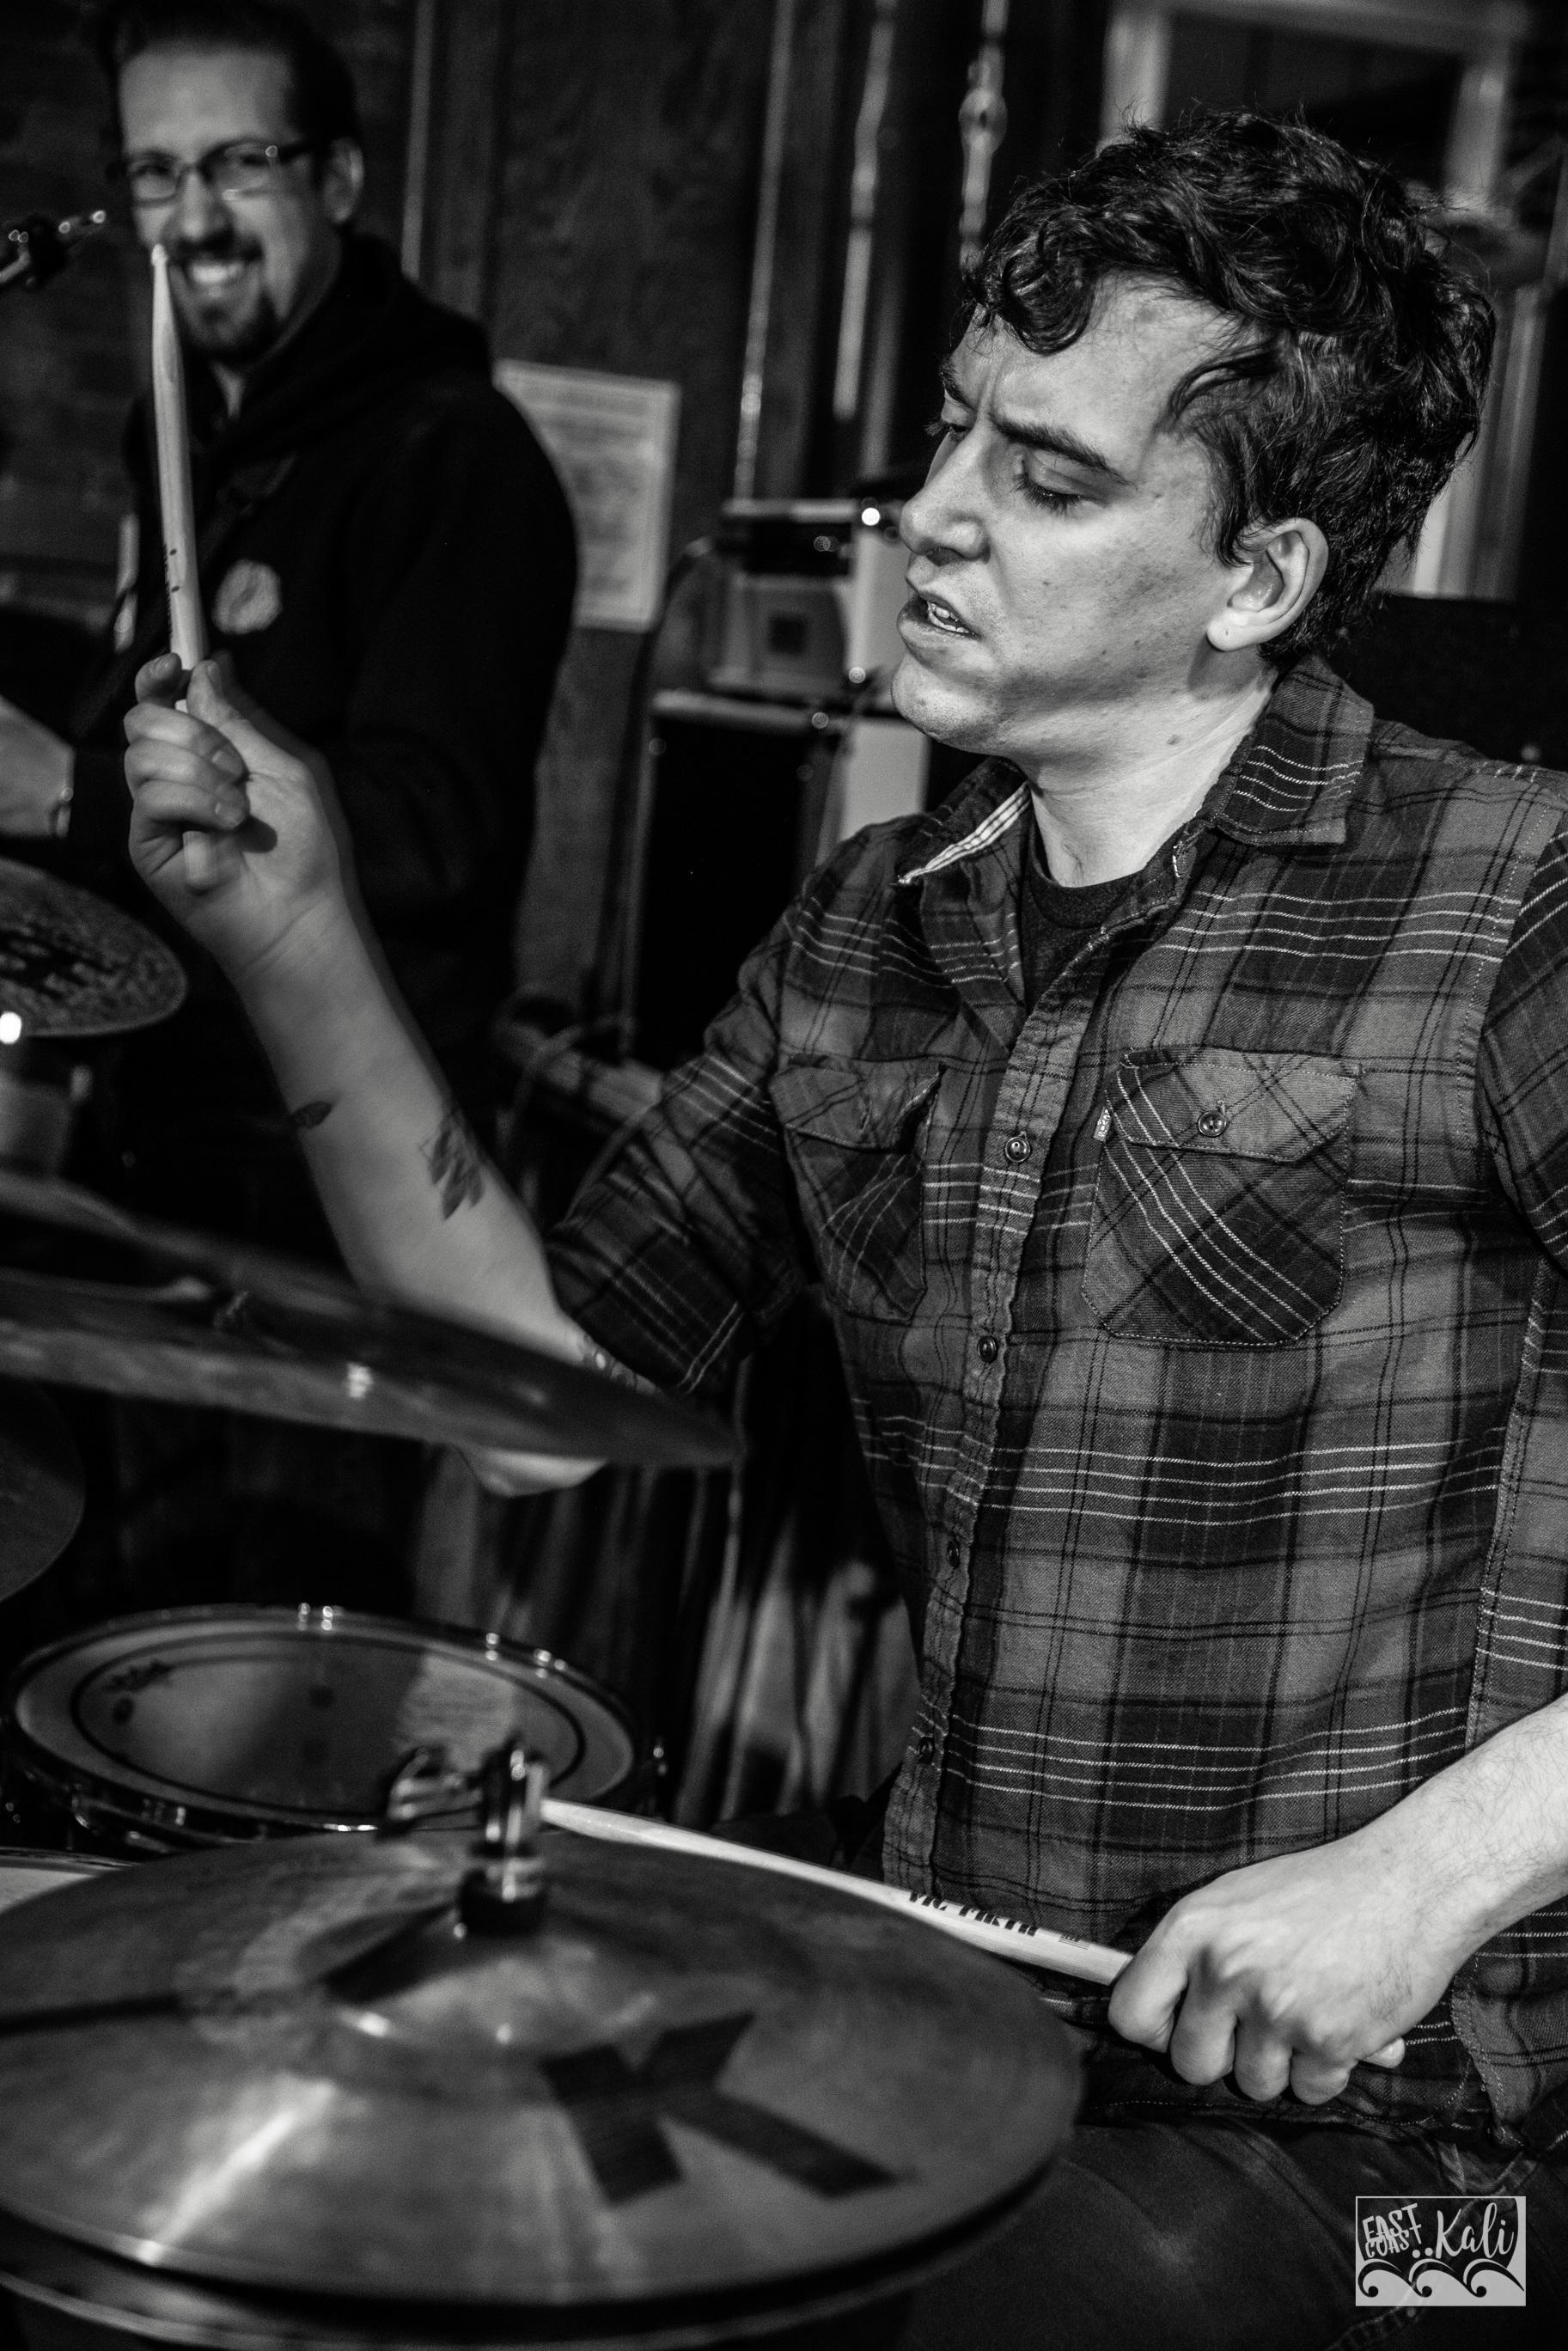 Steve Remp - drums/vocals